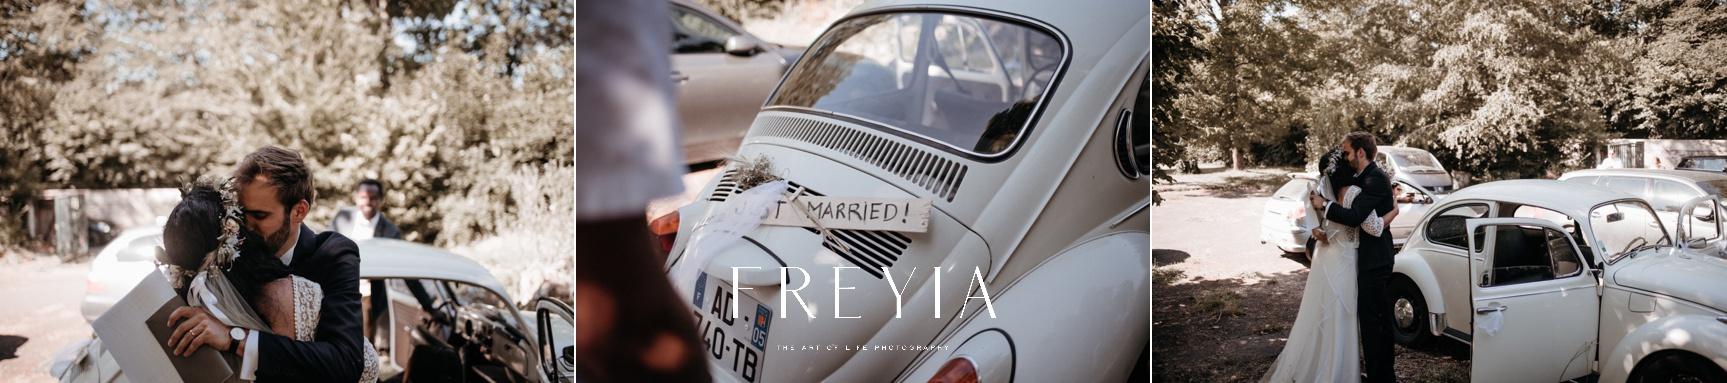 R + T |  mariage reportage alternatif moody intime minimaliste vintage naturel boho boheme |  PHOTOGRAPHE mariage PARIS france destination  | FREYIA photography_-206.jpg